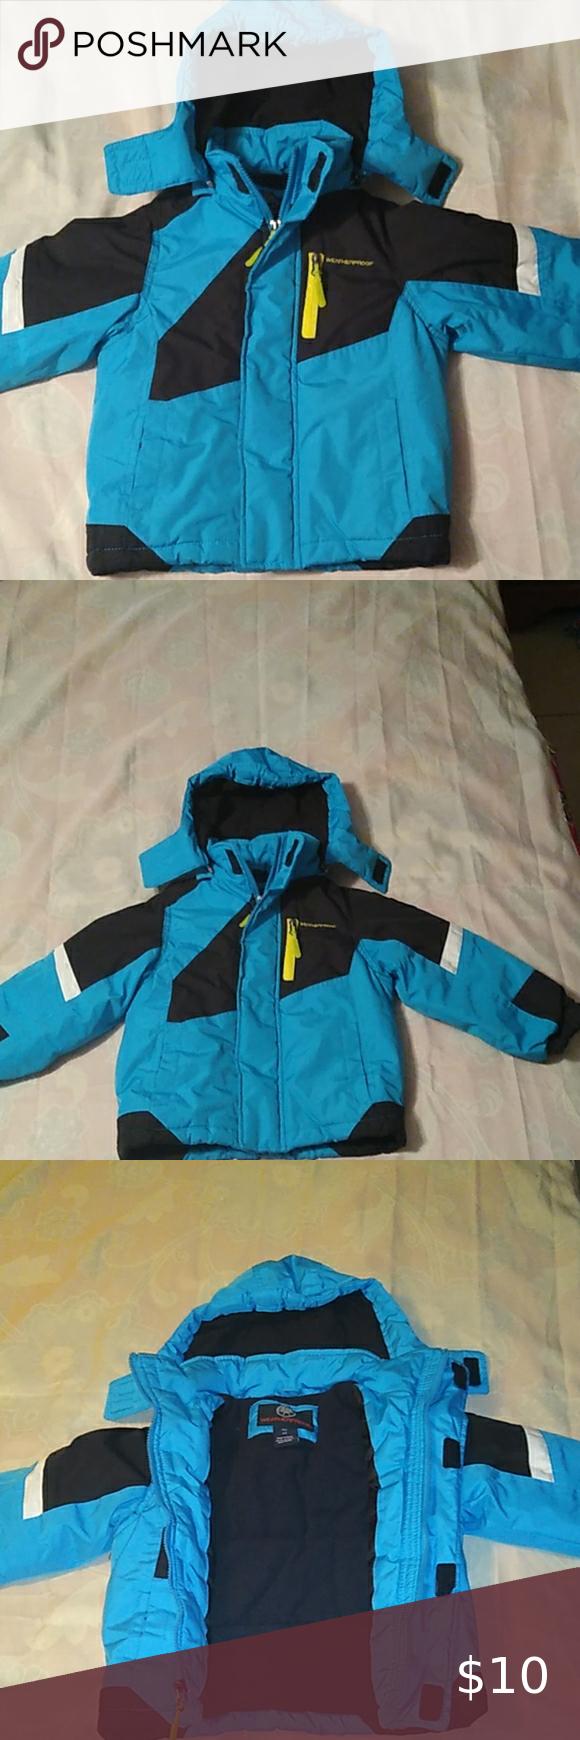 Weatherproof Boys Winter Coat Size 4 Weatherproof Boys Winter Coat 100 Polyester Lowest I Can Go Unless Bundled In 2020 Weatherproof Jacket Boys Winter Coats Fashion [ 1740 x 580 Pixel ]